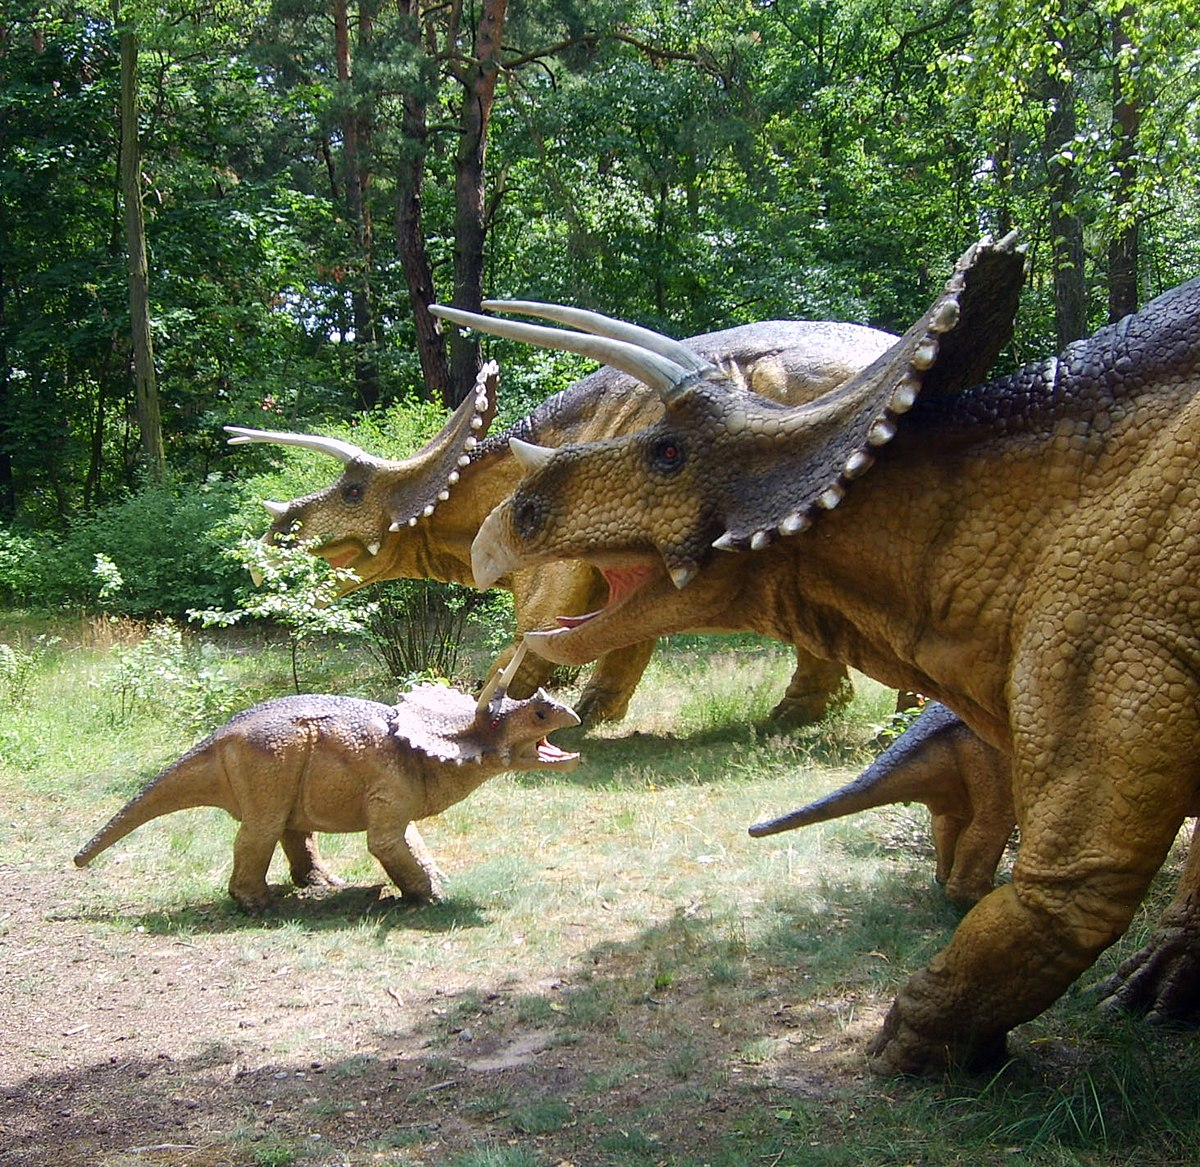 les chasseurs de dinosaures  u2014 wikip u00e9dia